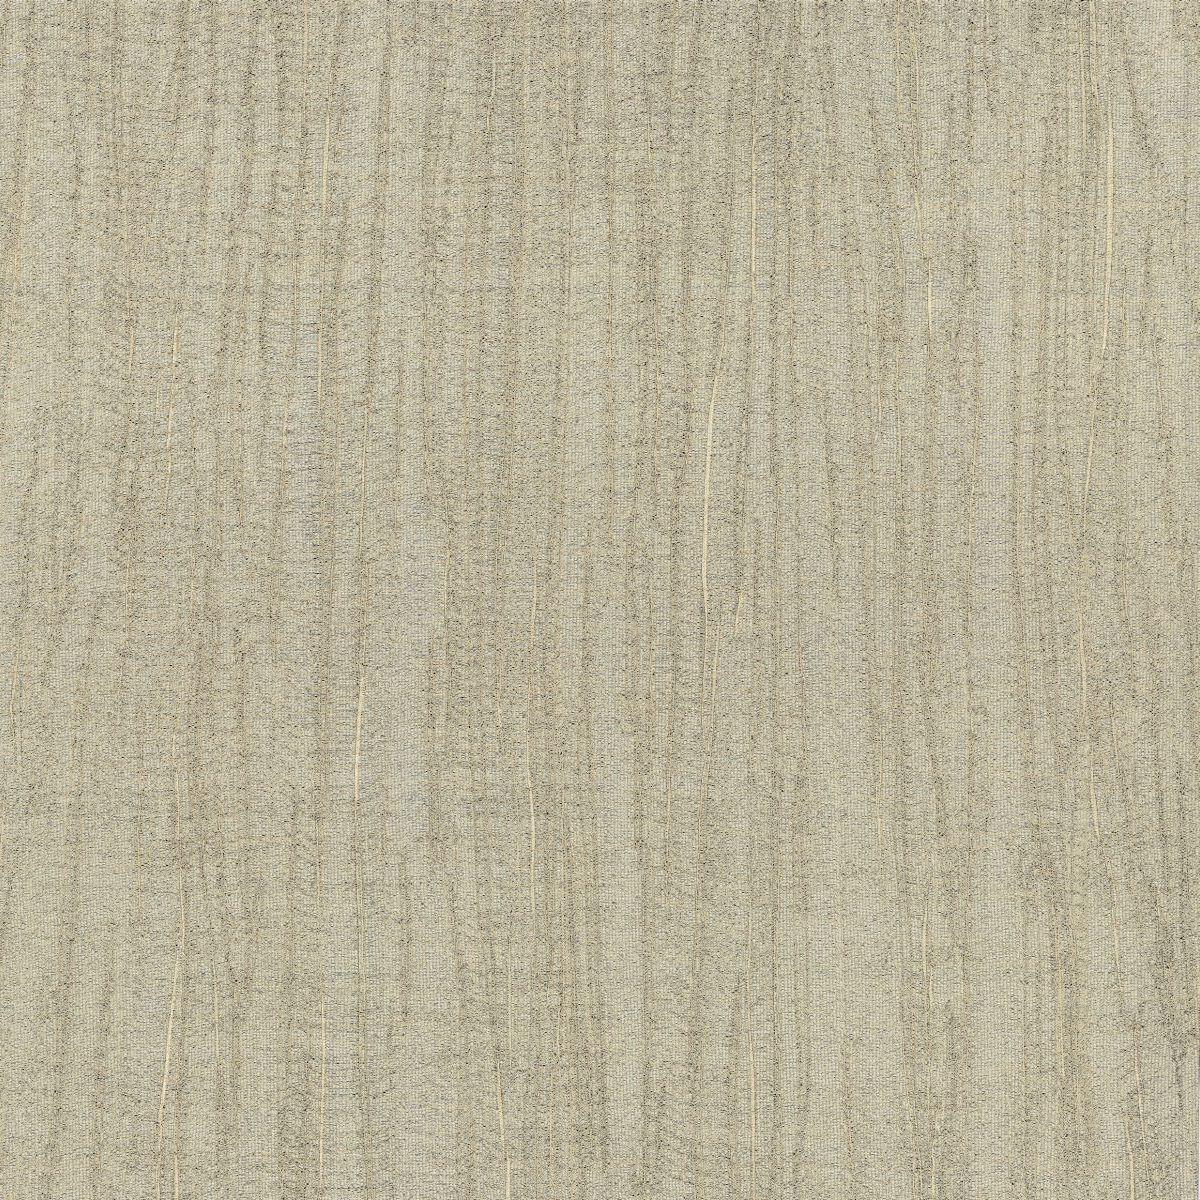 tapete mit plisseestoff amazone 2 23526 amazone 2 decowunder. Black Bedroom Furniture Sets. Home Design Ideas